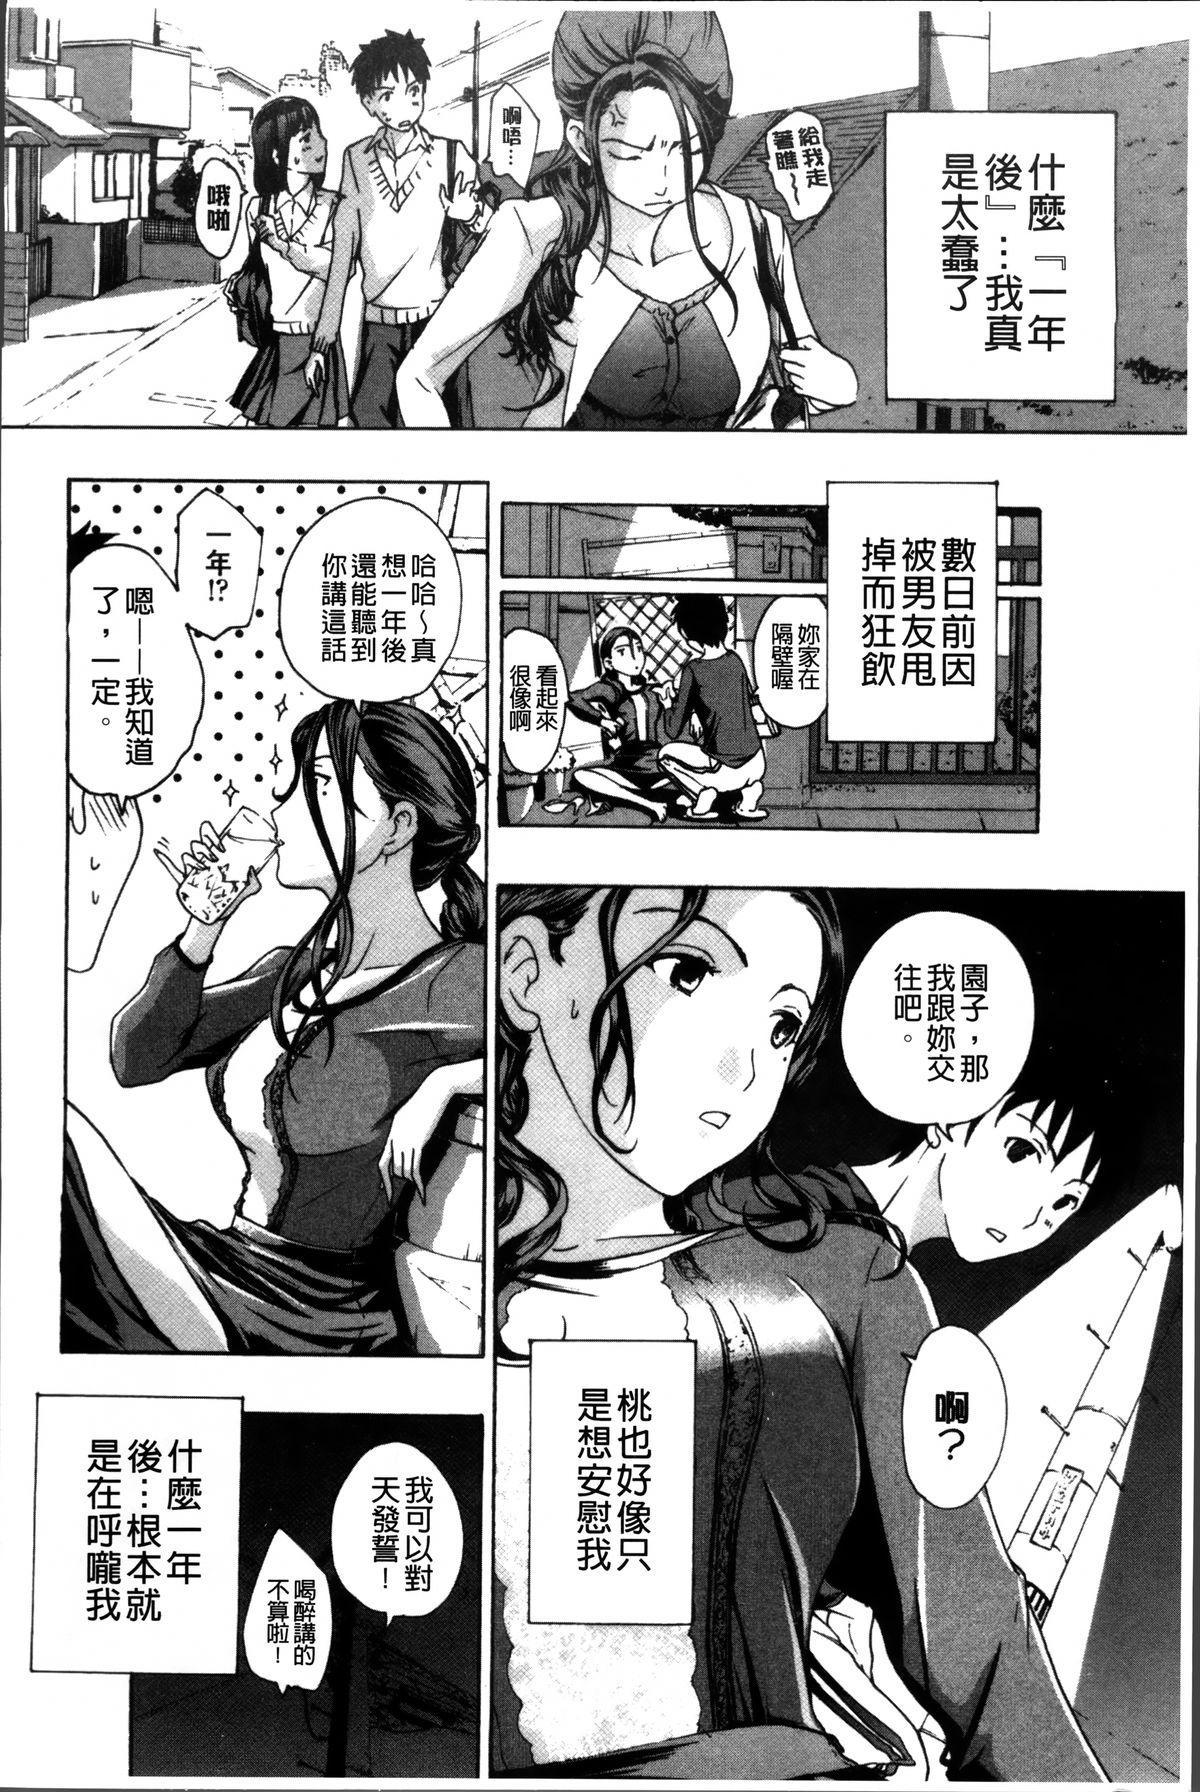 Onee-san to Koi Shiyou 154